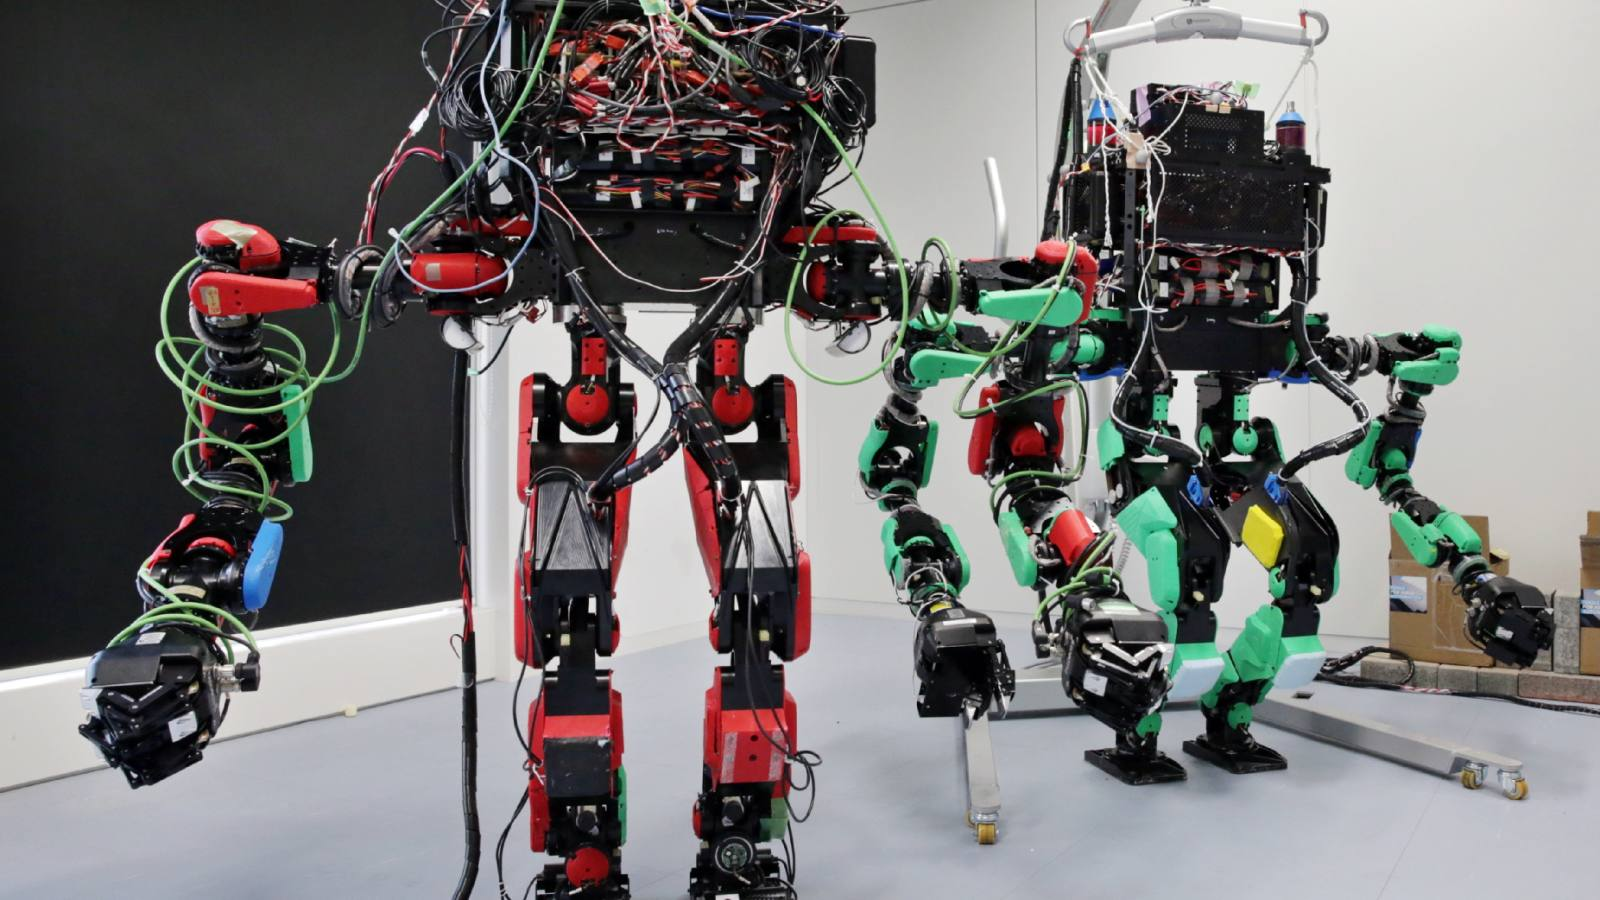 SoftBank unveils AI vacuum robot for offices - Nikkei Asian